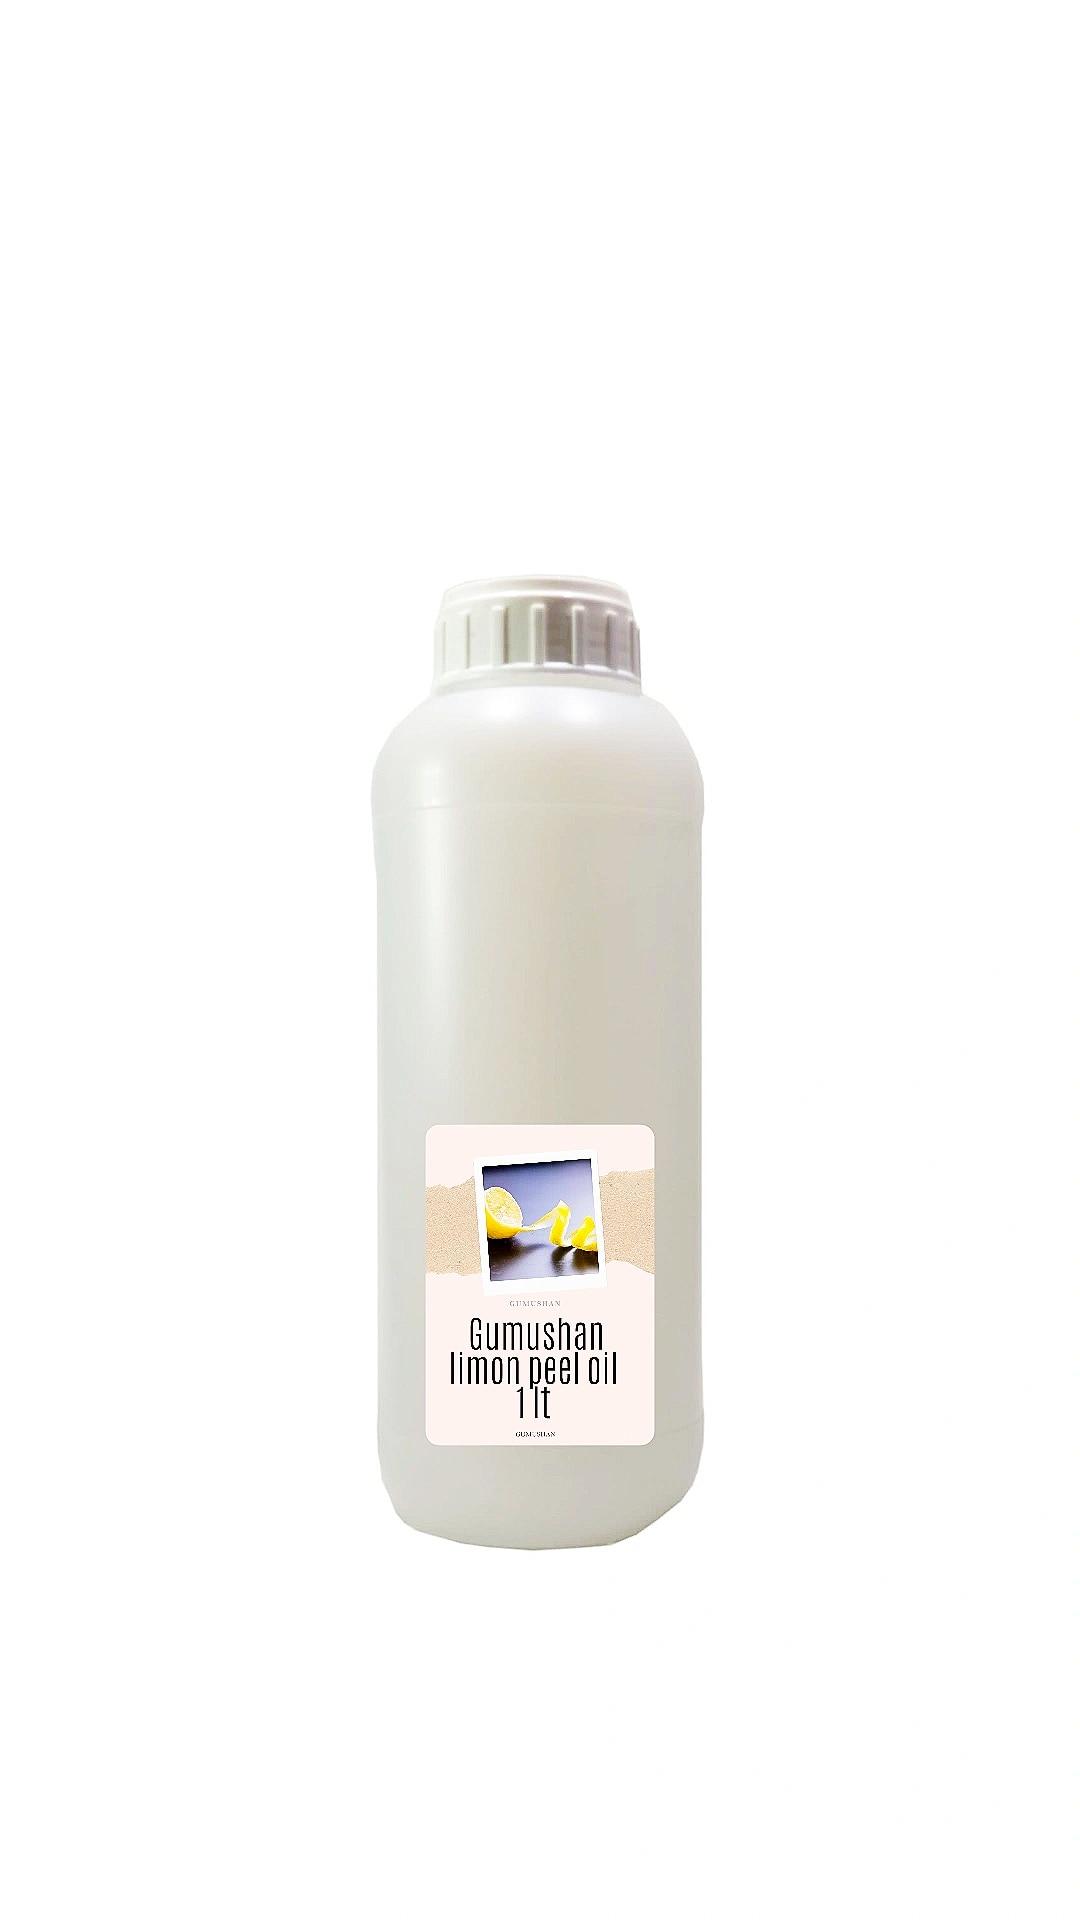 High quality pure Limon Peel  Oil 1 liter 34 fl oz 1000ml